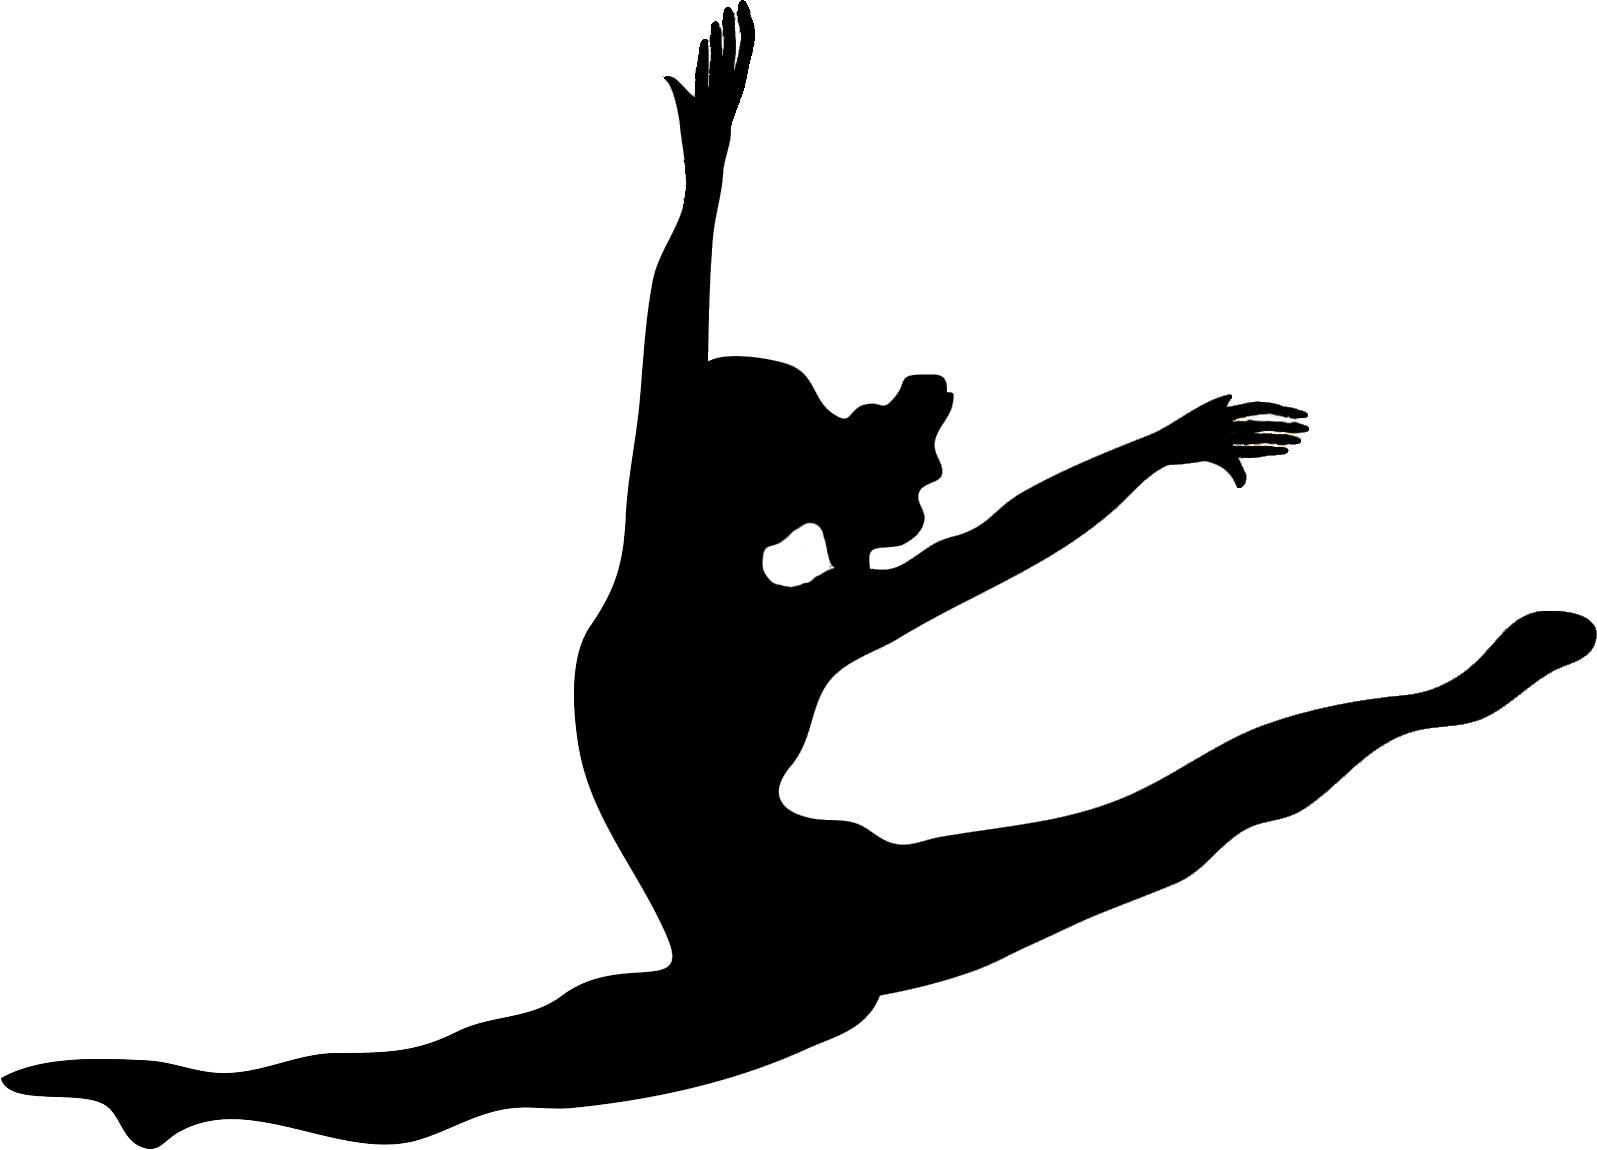 cartoon dancer silhouette at getdrawings com free for personal use rh getdrawings com Dancer Clip Art Black and White cartoon dancers clip art